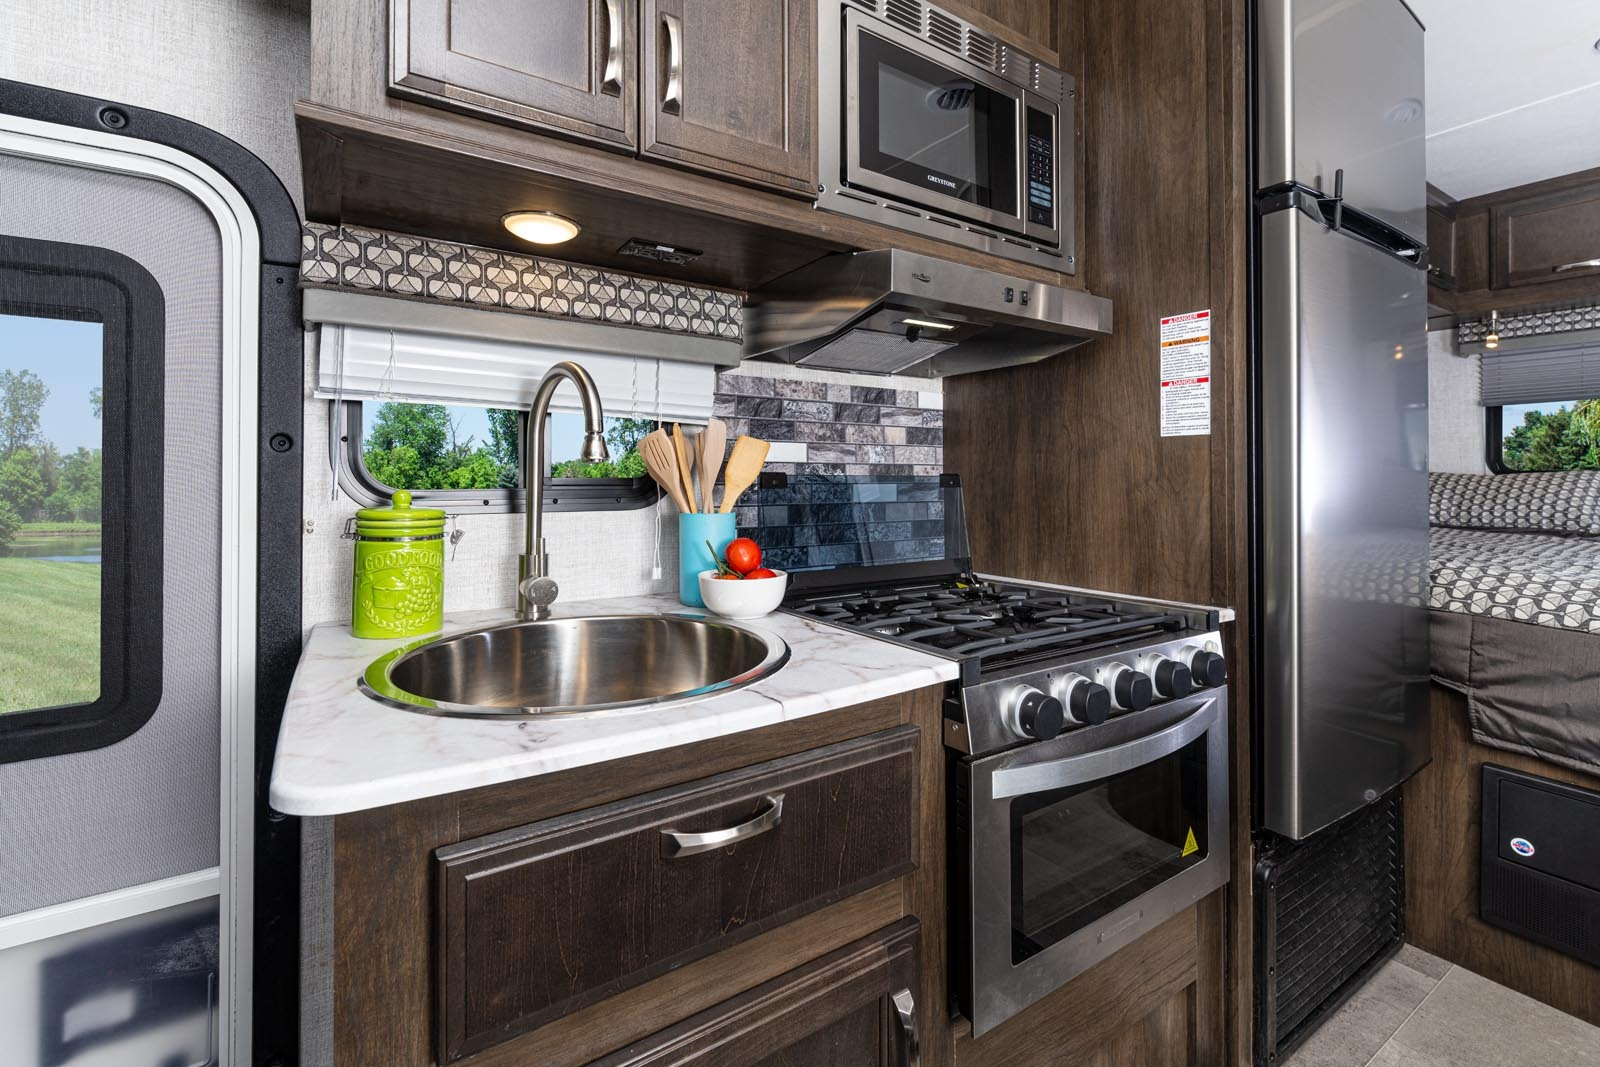 Easy access kitchen.. Gulf Stream Conquest 2021